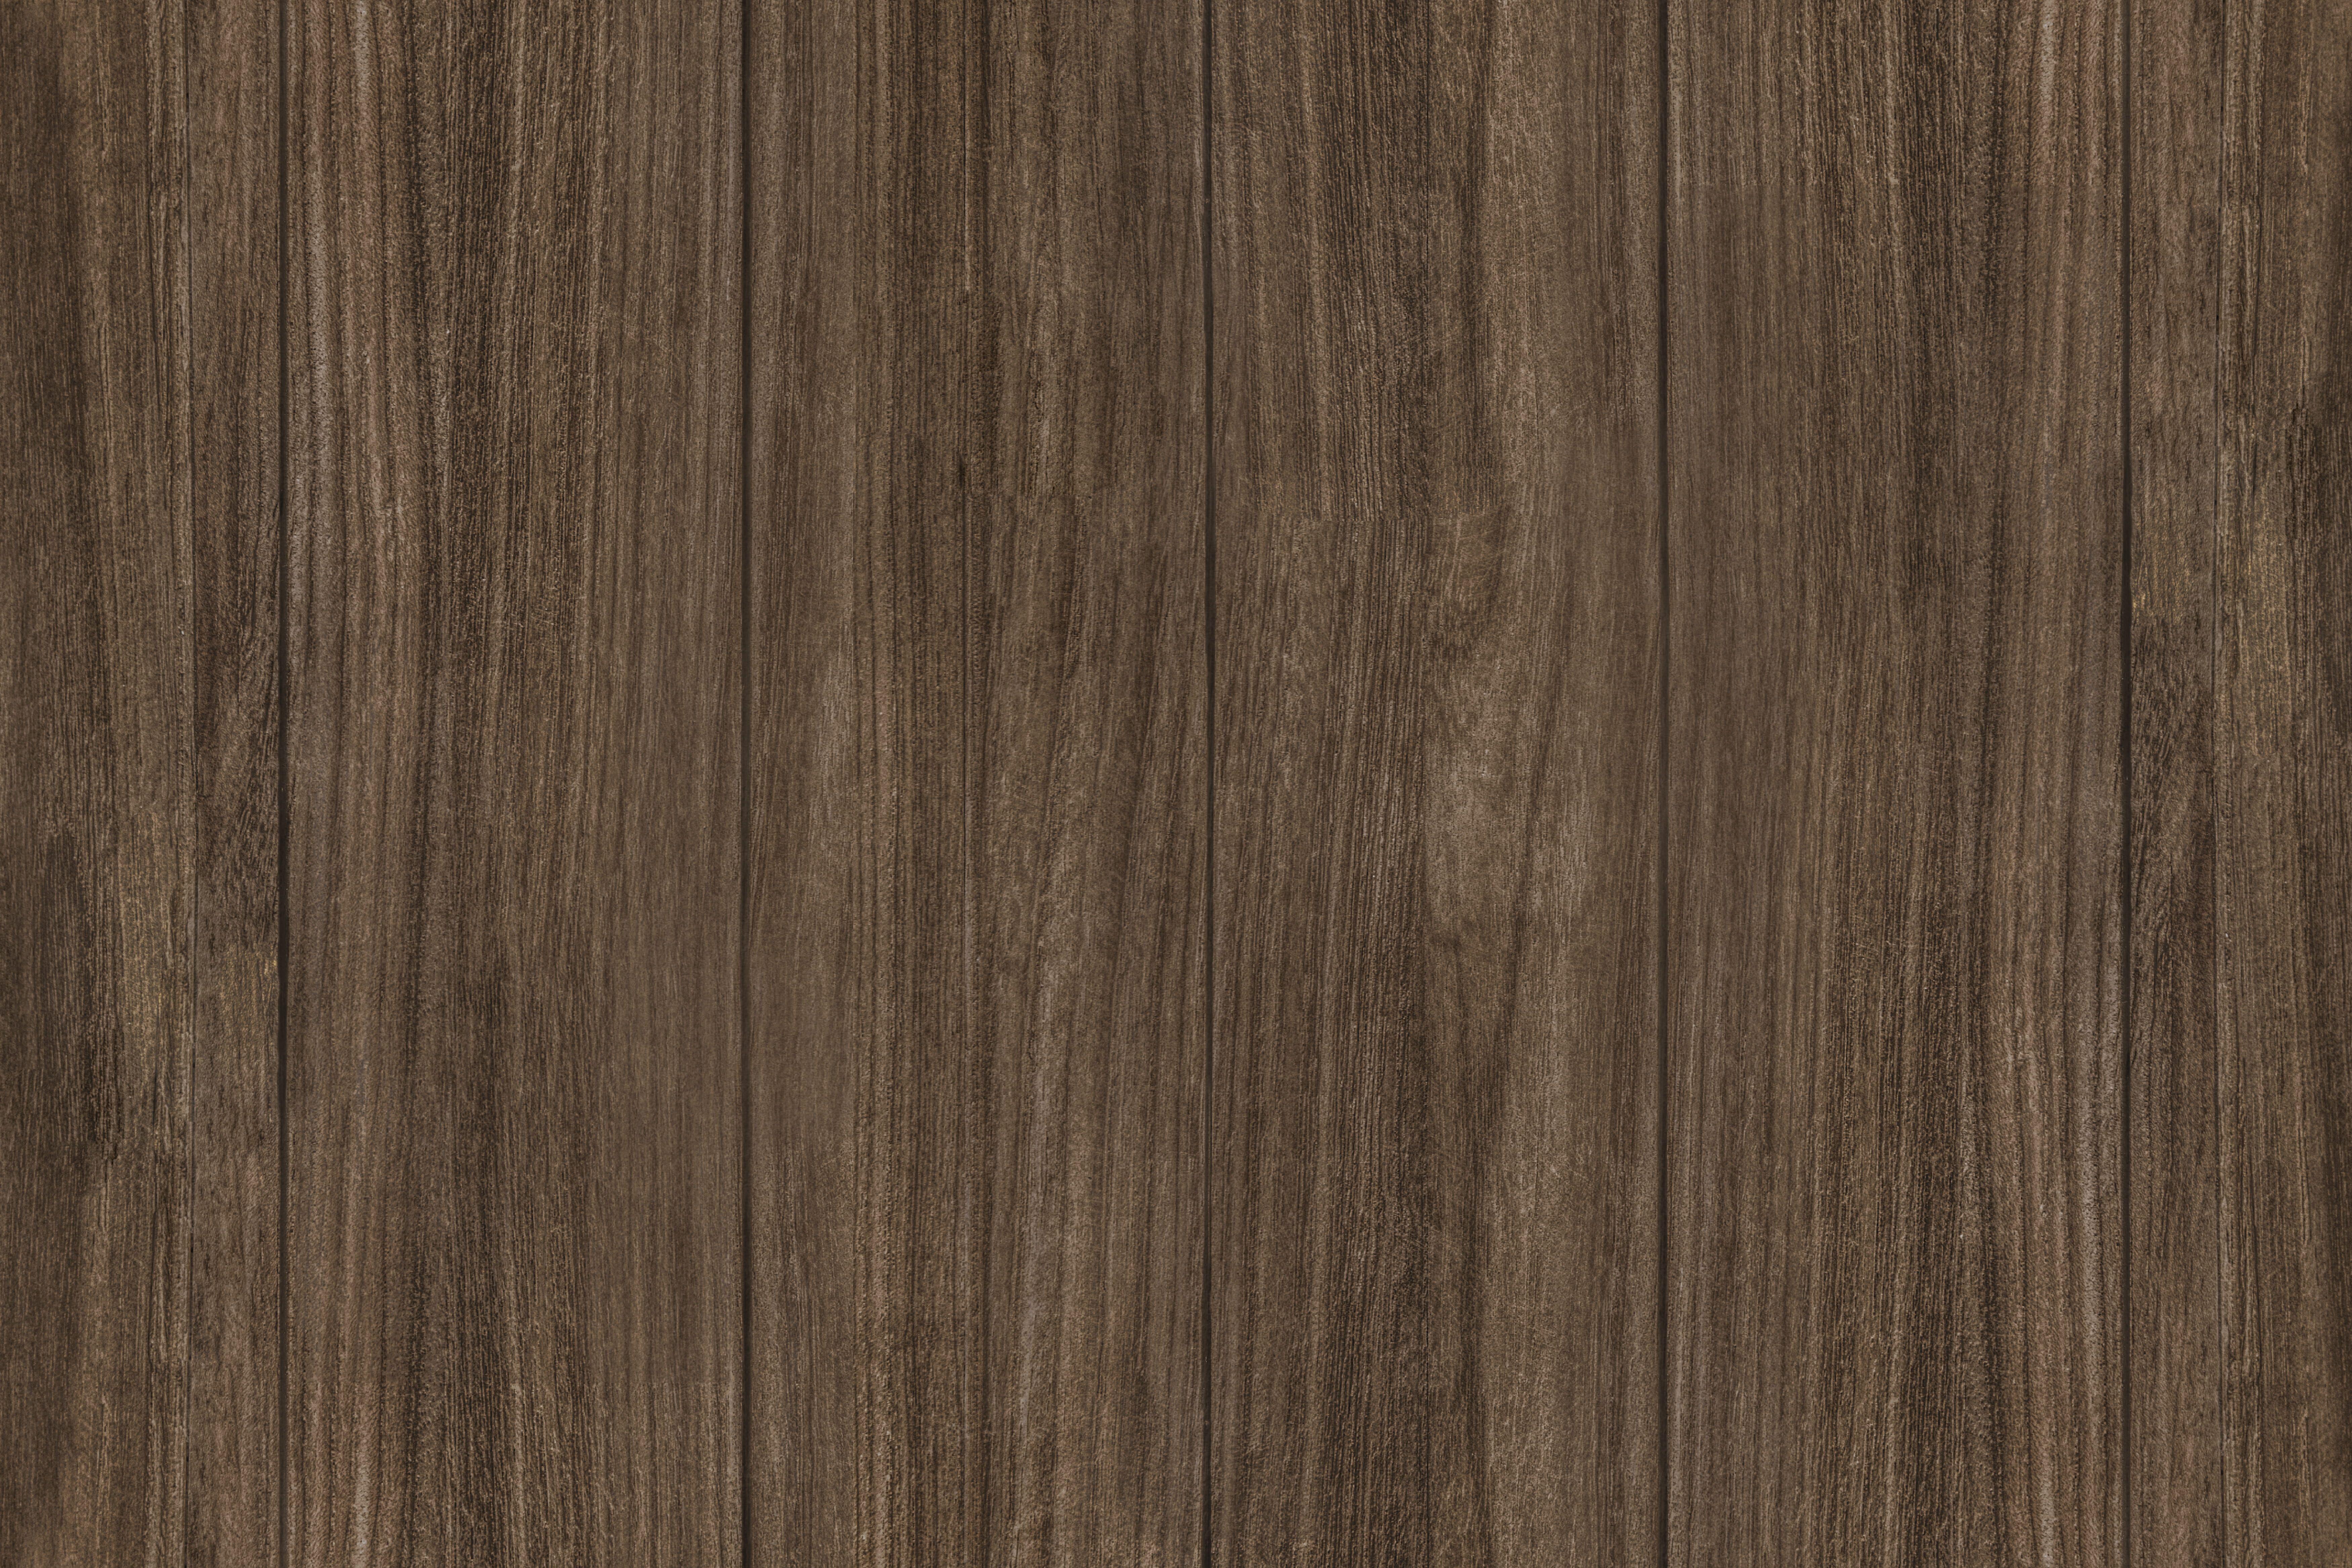 Photo Of Wooden Wallpaper 4k Wallpaper Background Brown Hardwood Hd Wallpaper Surface Textu In 2020 Wooden Wallpaper Wood Texture Background Backdrops Backgrounds